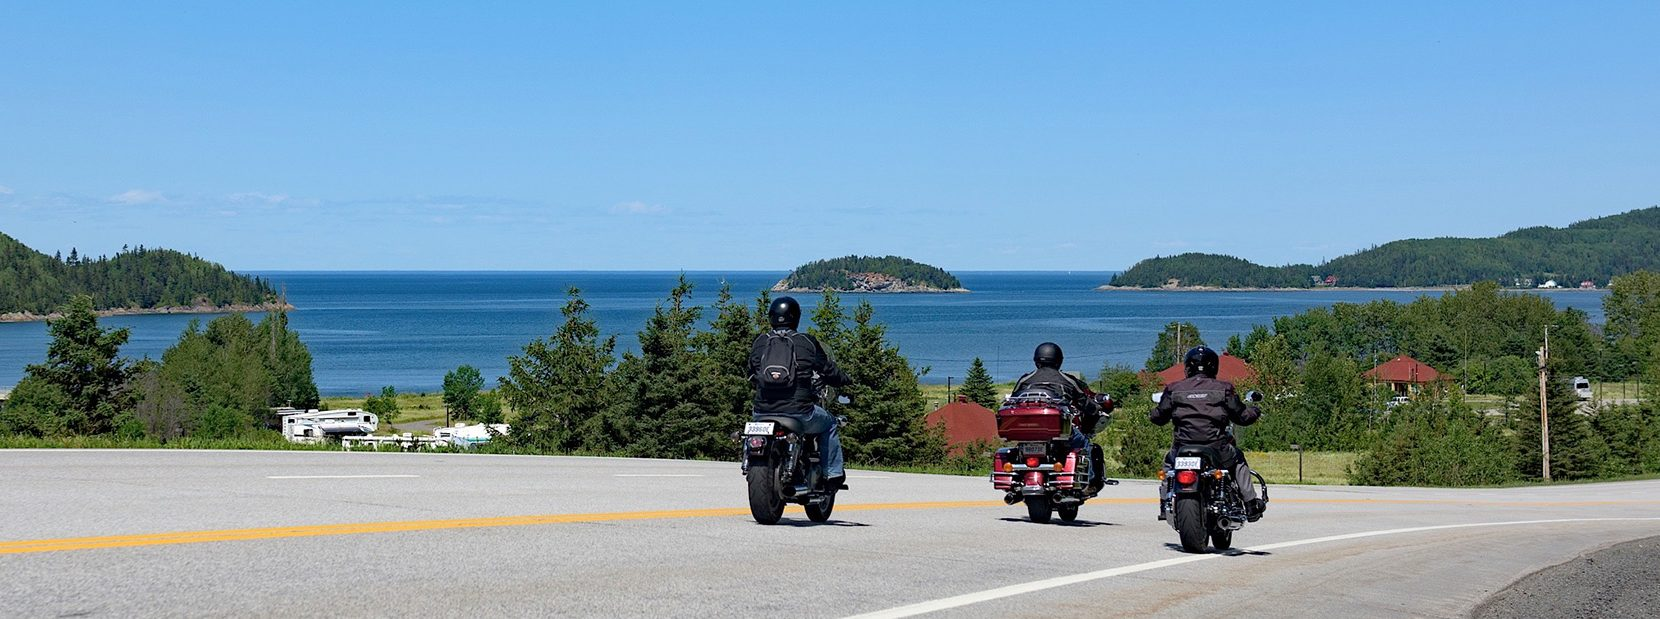 https://tourismerimouski.com/wp-content/uploads/2021/01/motos-parc-du-bic-e1613673895815.jpg